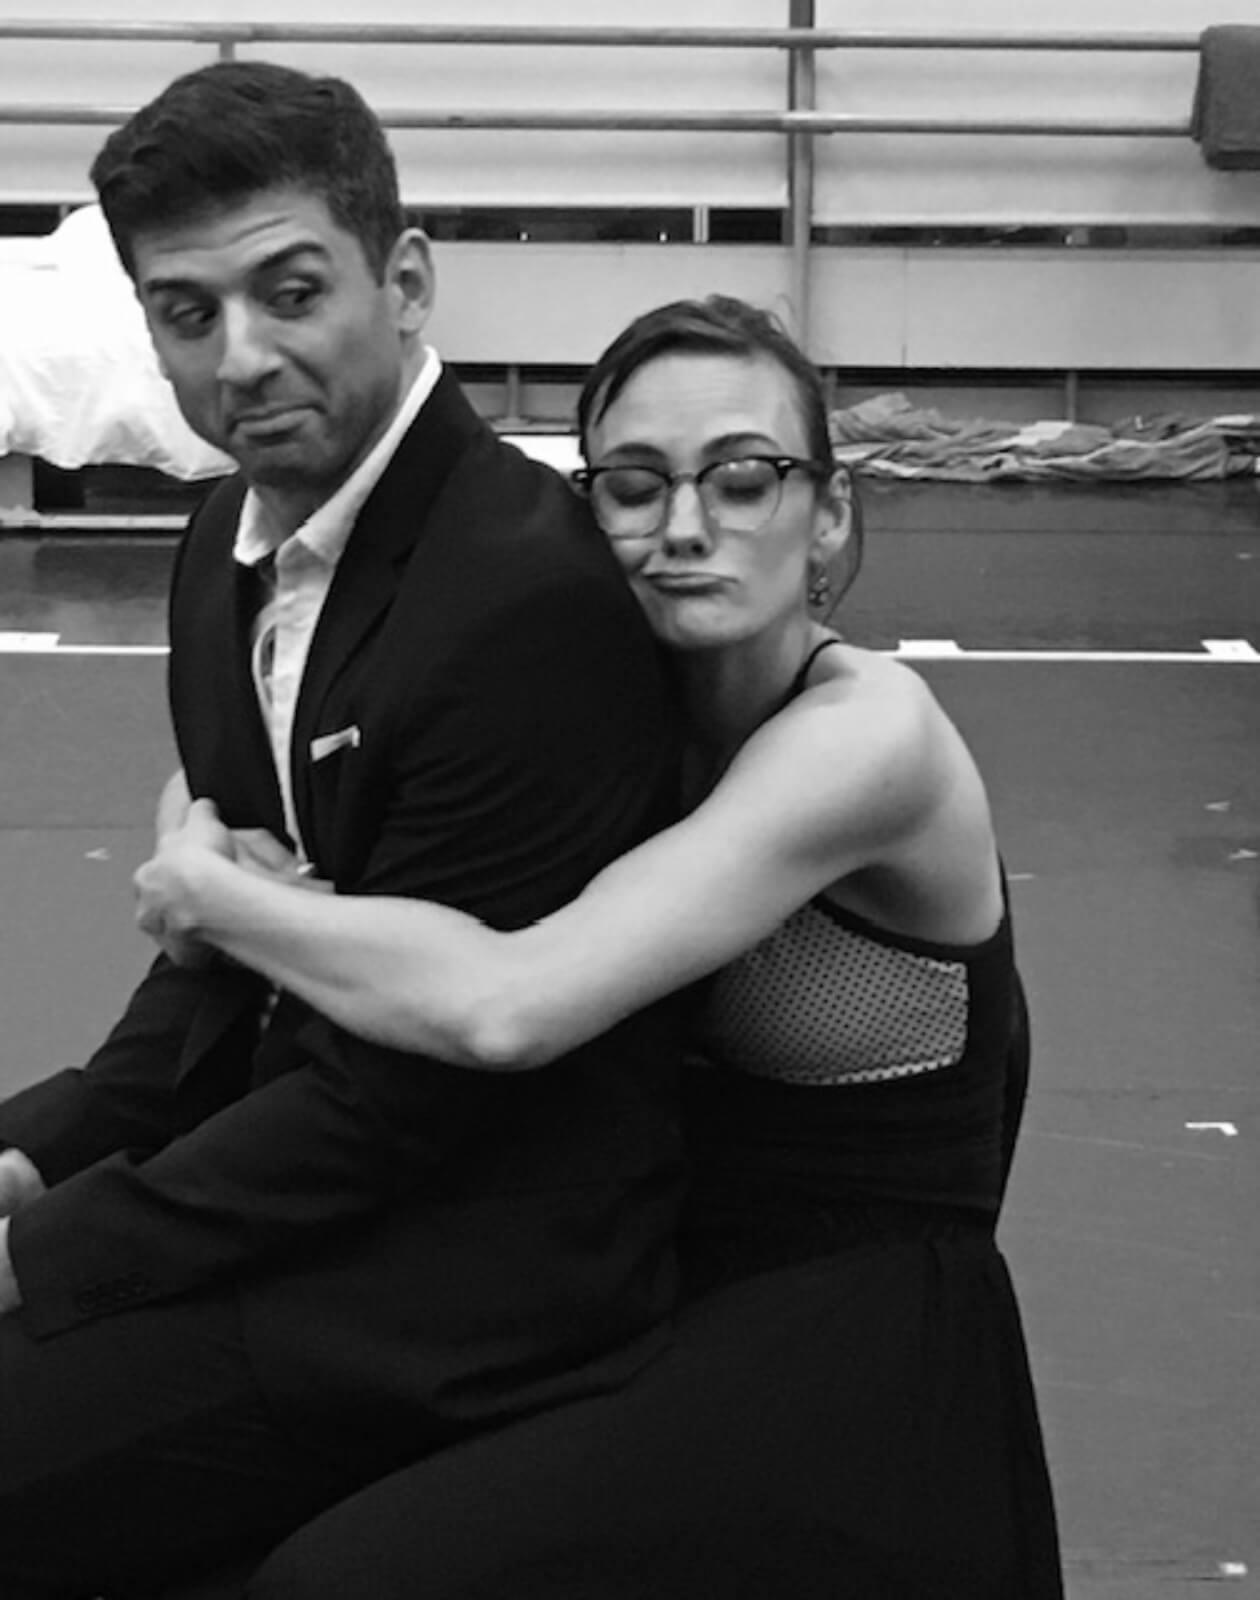 Rehearsal photo of dance captain Leah Hofmann hugging Tony Yazbeck.